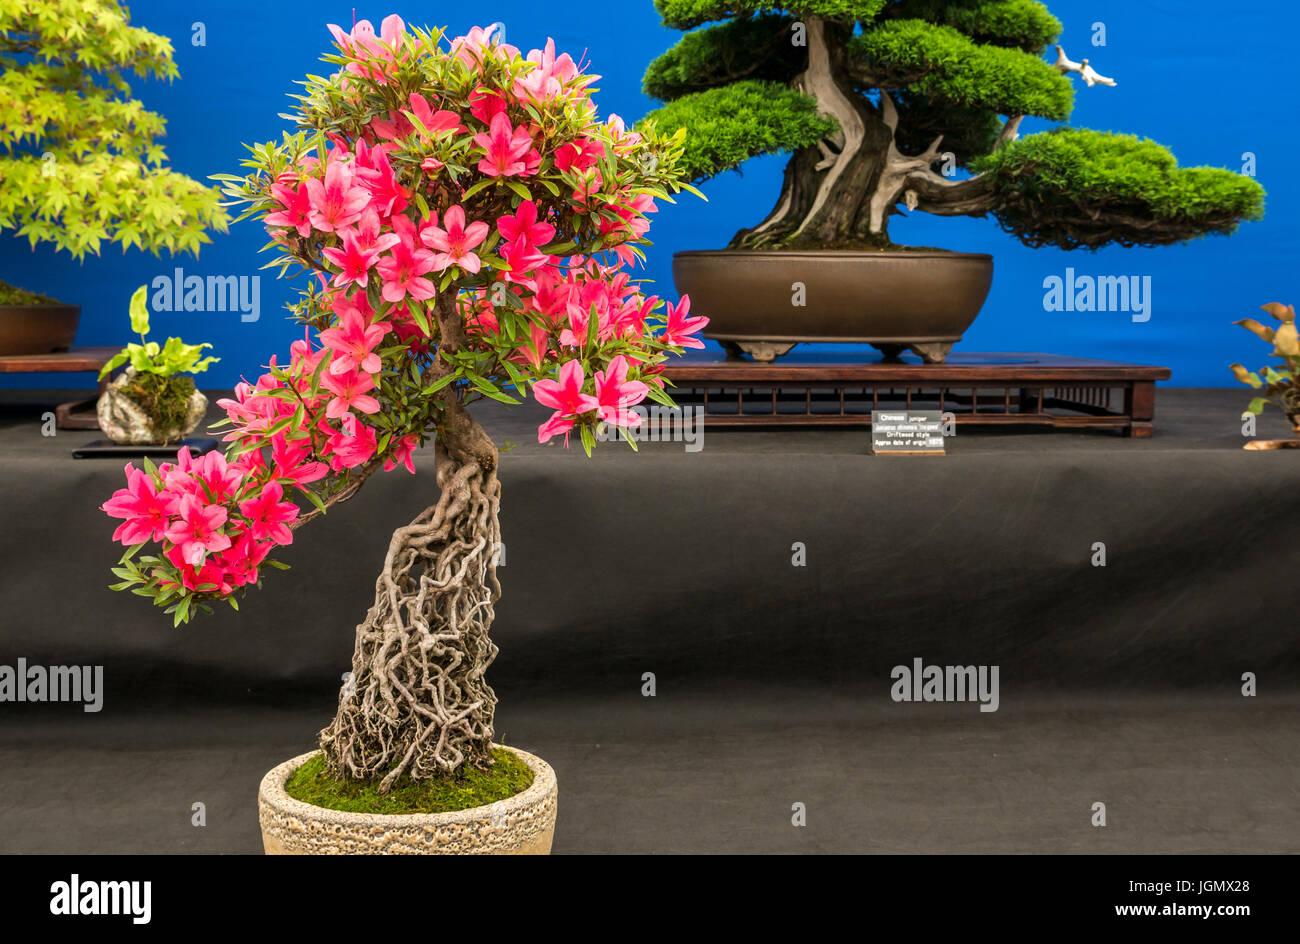 Bonsai exhibit stock photos bonsai exhibit stock images - Chicago flower and garden show 2017 ...